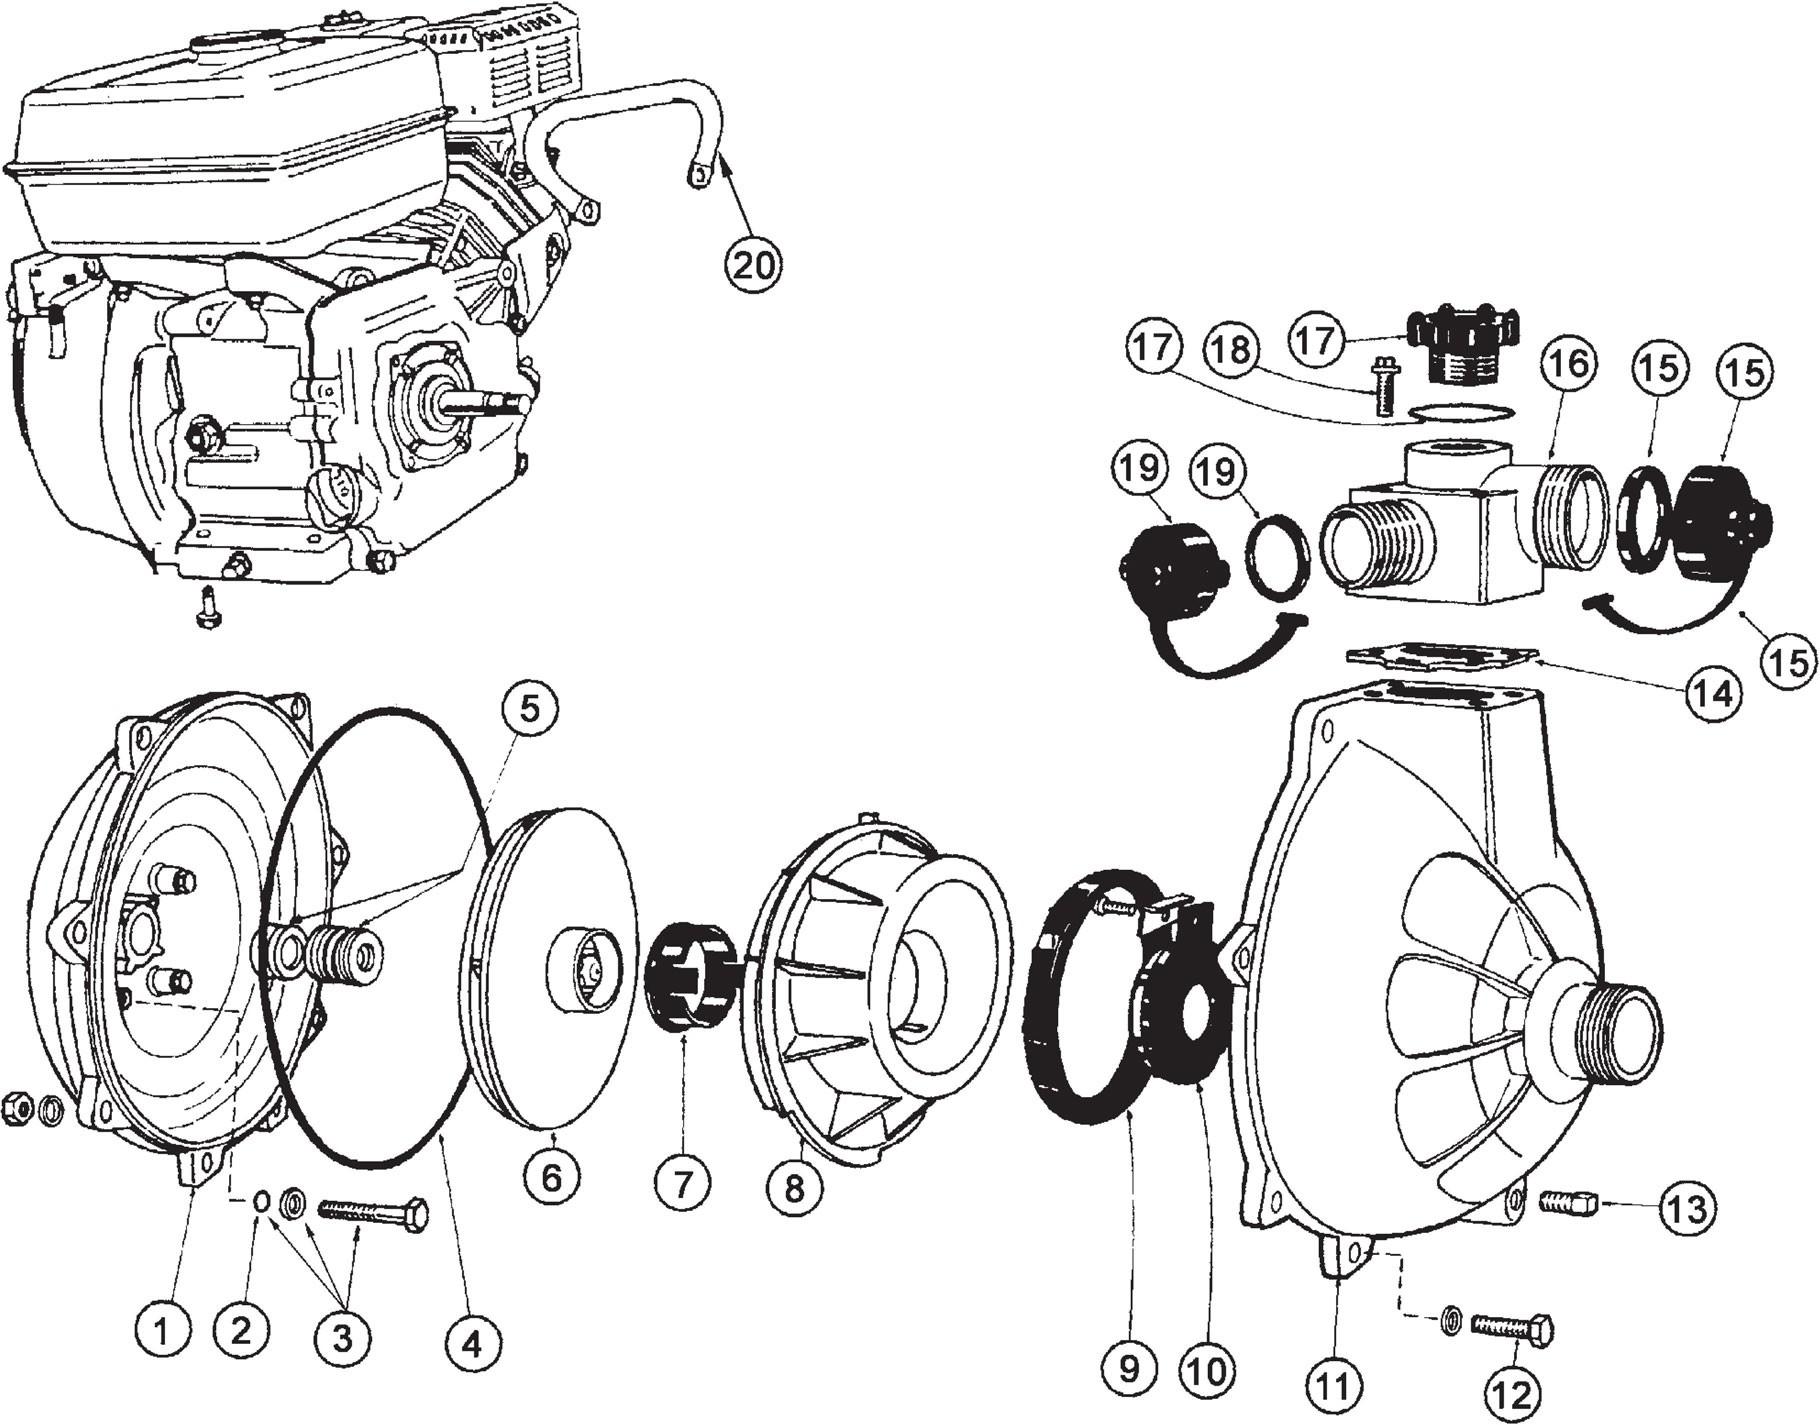 Honda 300 Fourtrax Parts Diagram Davey 931 Pump Spares Breakdown Bidgee Pumps & Irrigation Your Of Honda 300 Fourtrax Parts Diagram